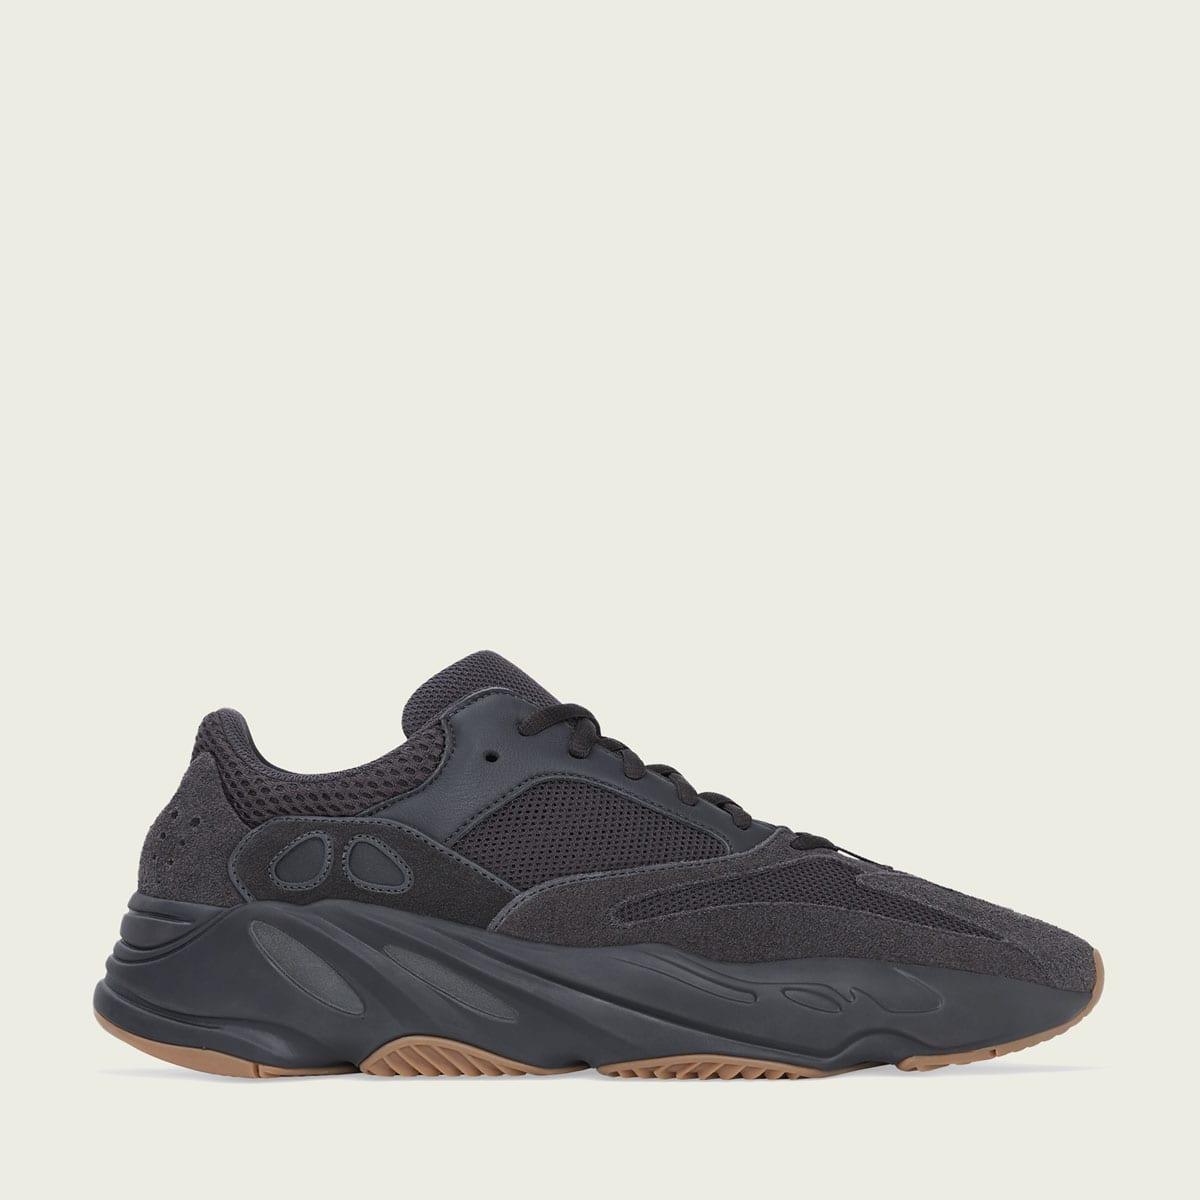 adidas Originals YEEZY BOOST 700 Utility Black 19FW-S_photo_large